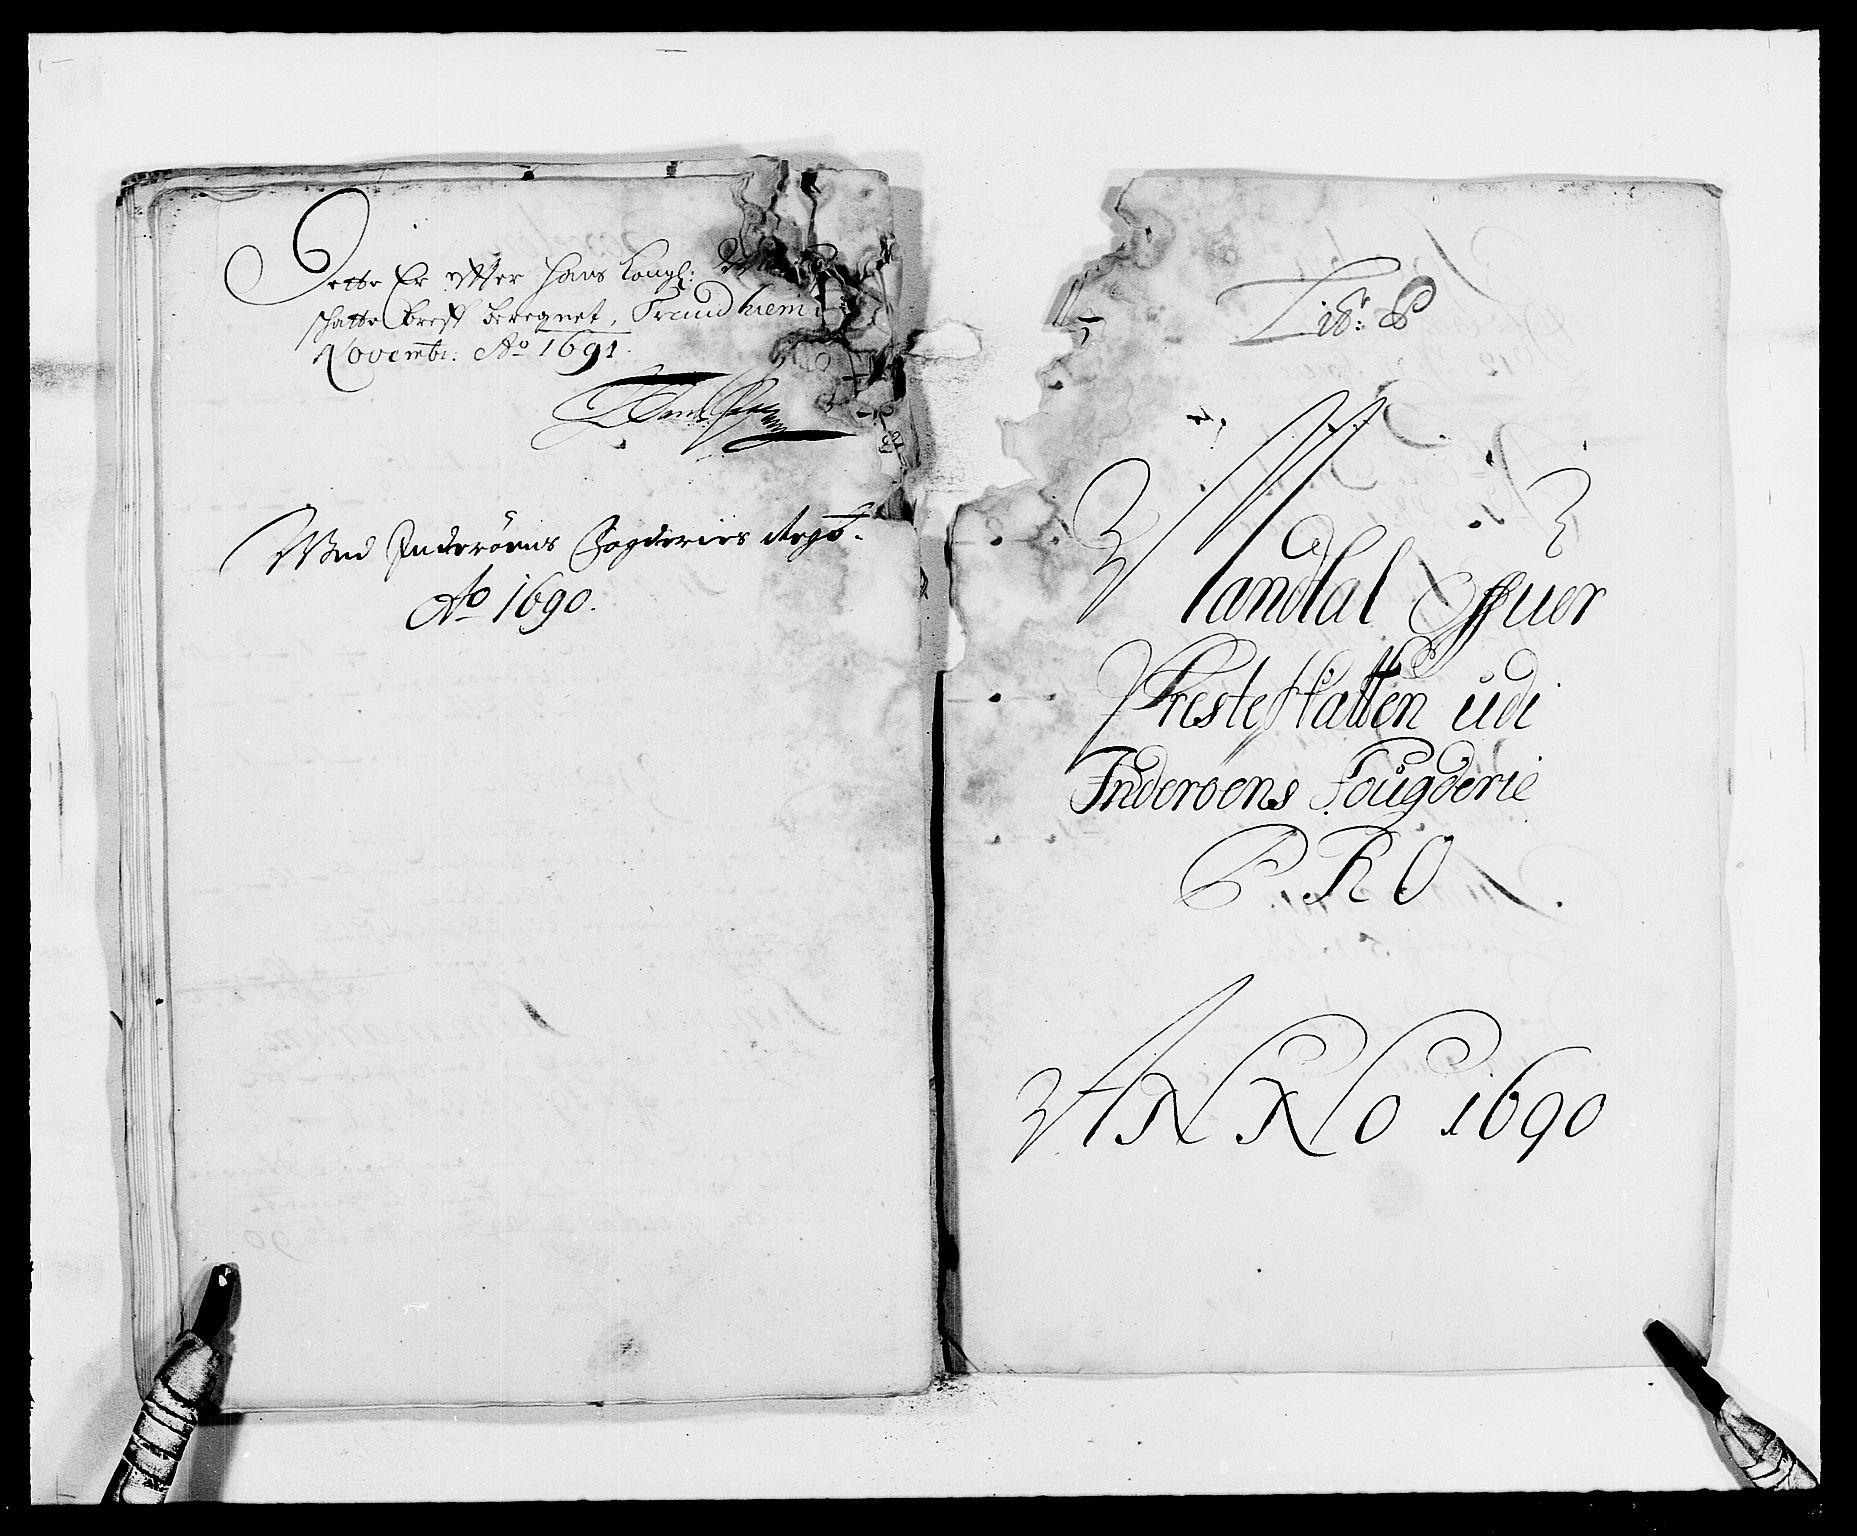 RA, Rentekammeret inntil 1814, Reviderte regnskaper, Fogderegnskap, R63/L4307: Fogderegnskap Inderøy, 1690-1691, s. 179